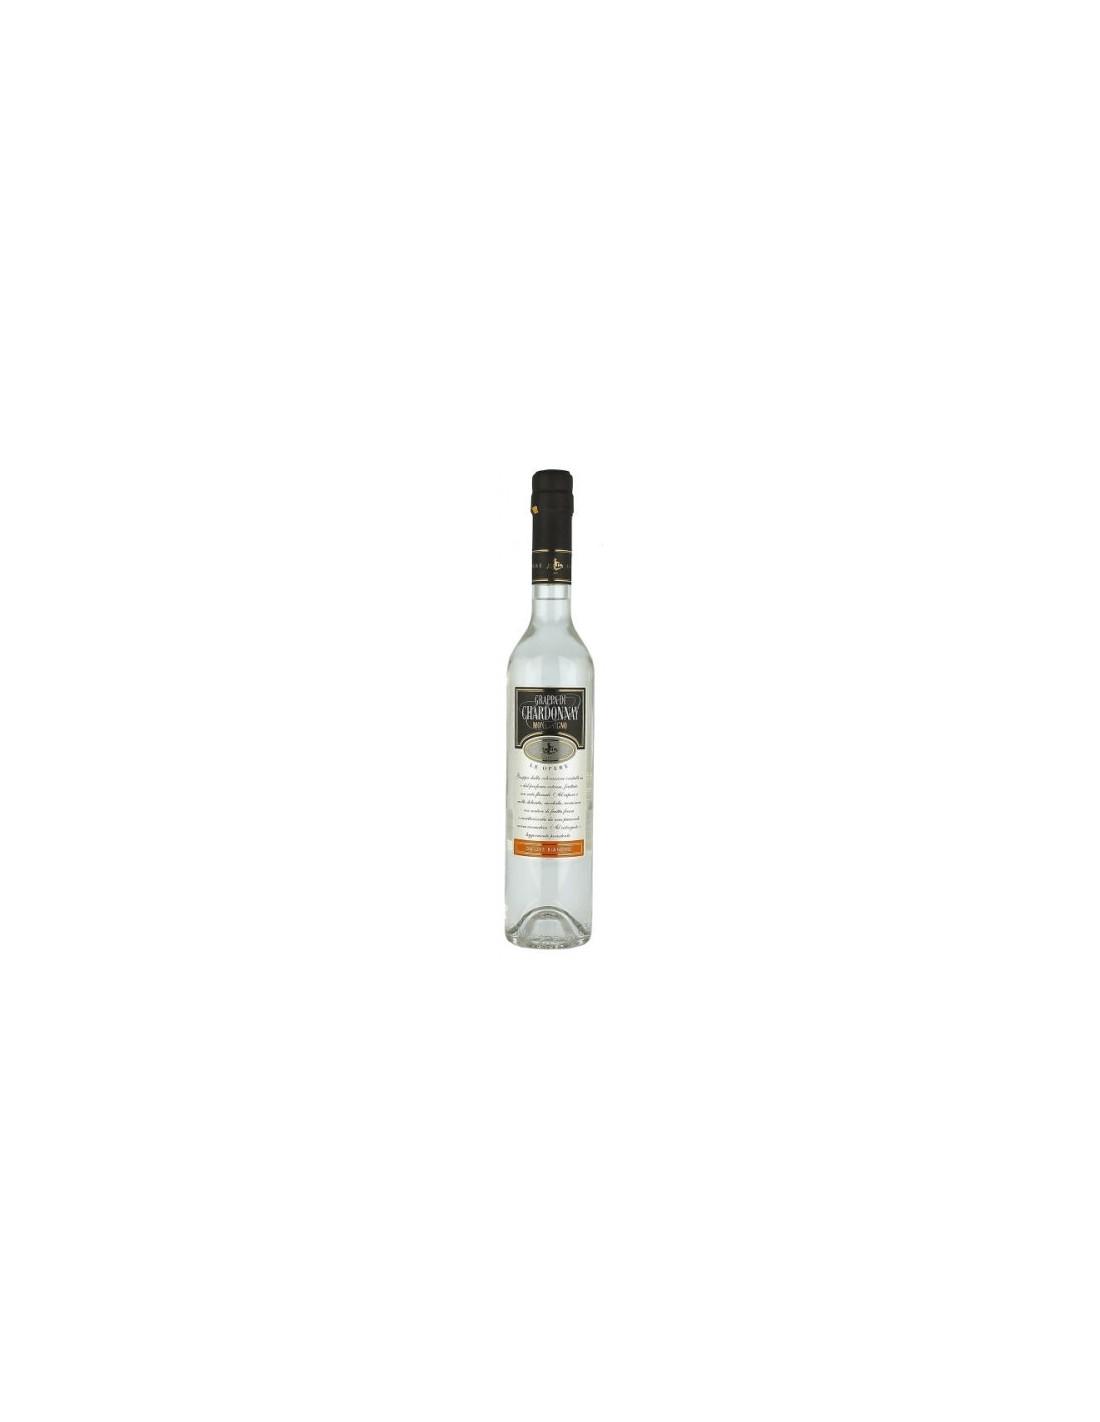 Bautura traditionala Grappa Chardonnay, 40% alc., 0.2L, Italia